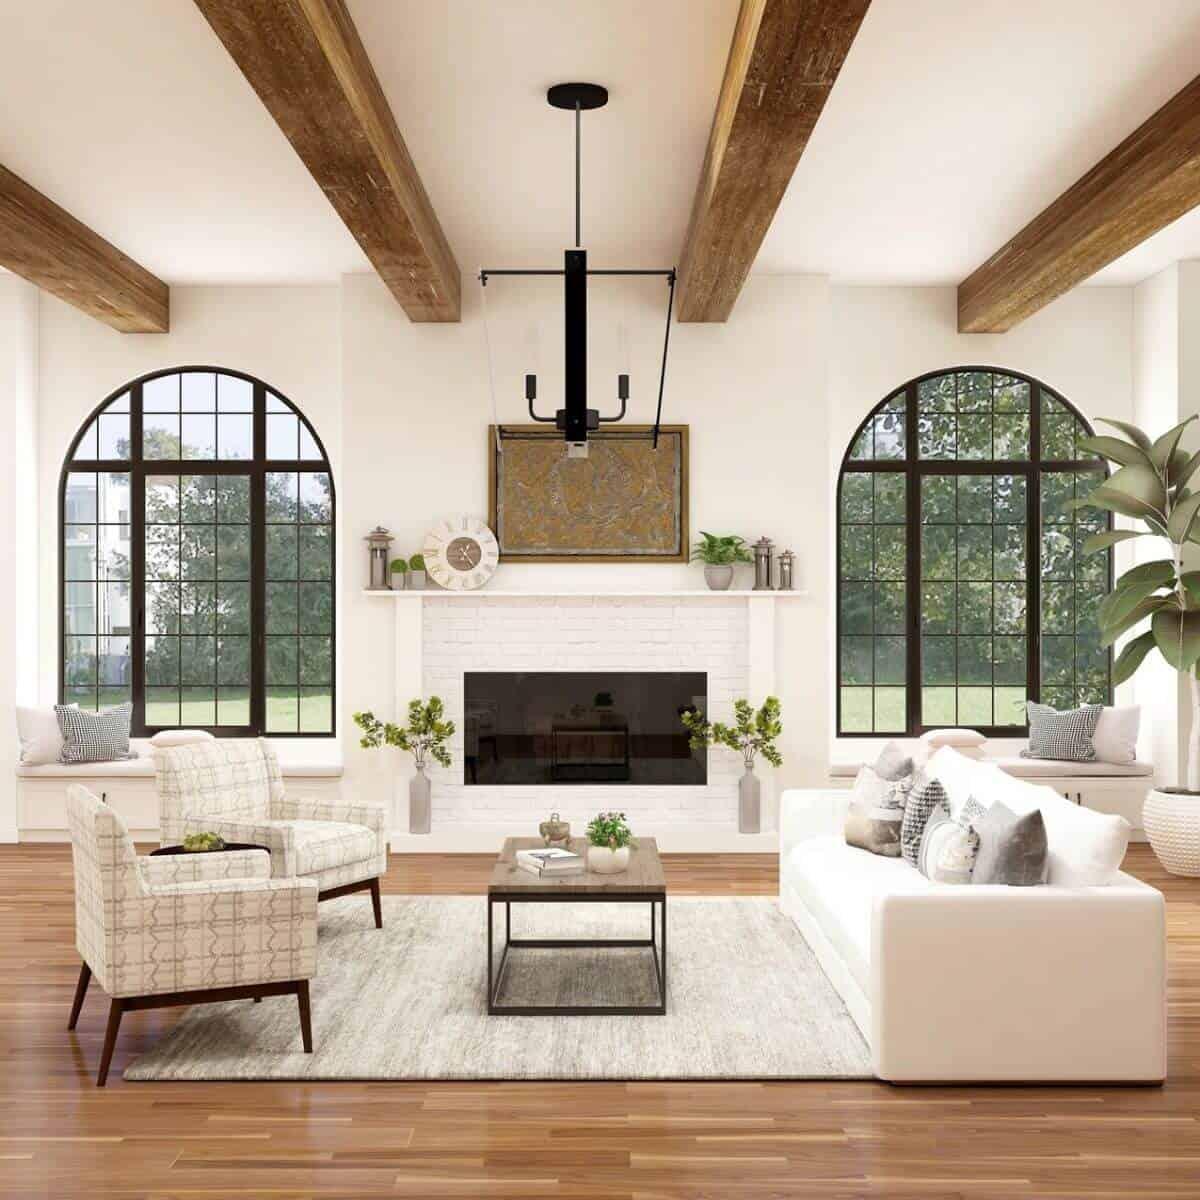 Modern farmhouse styled living room.